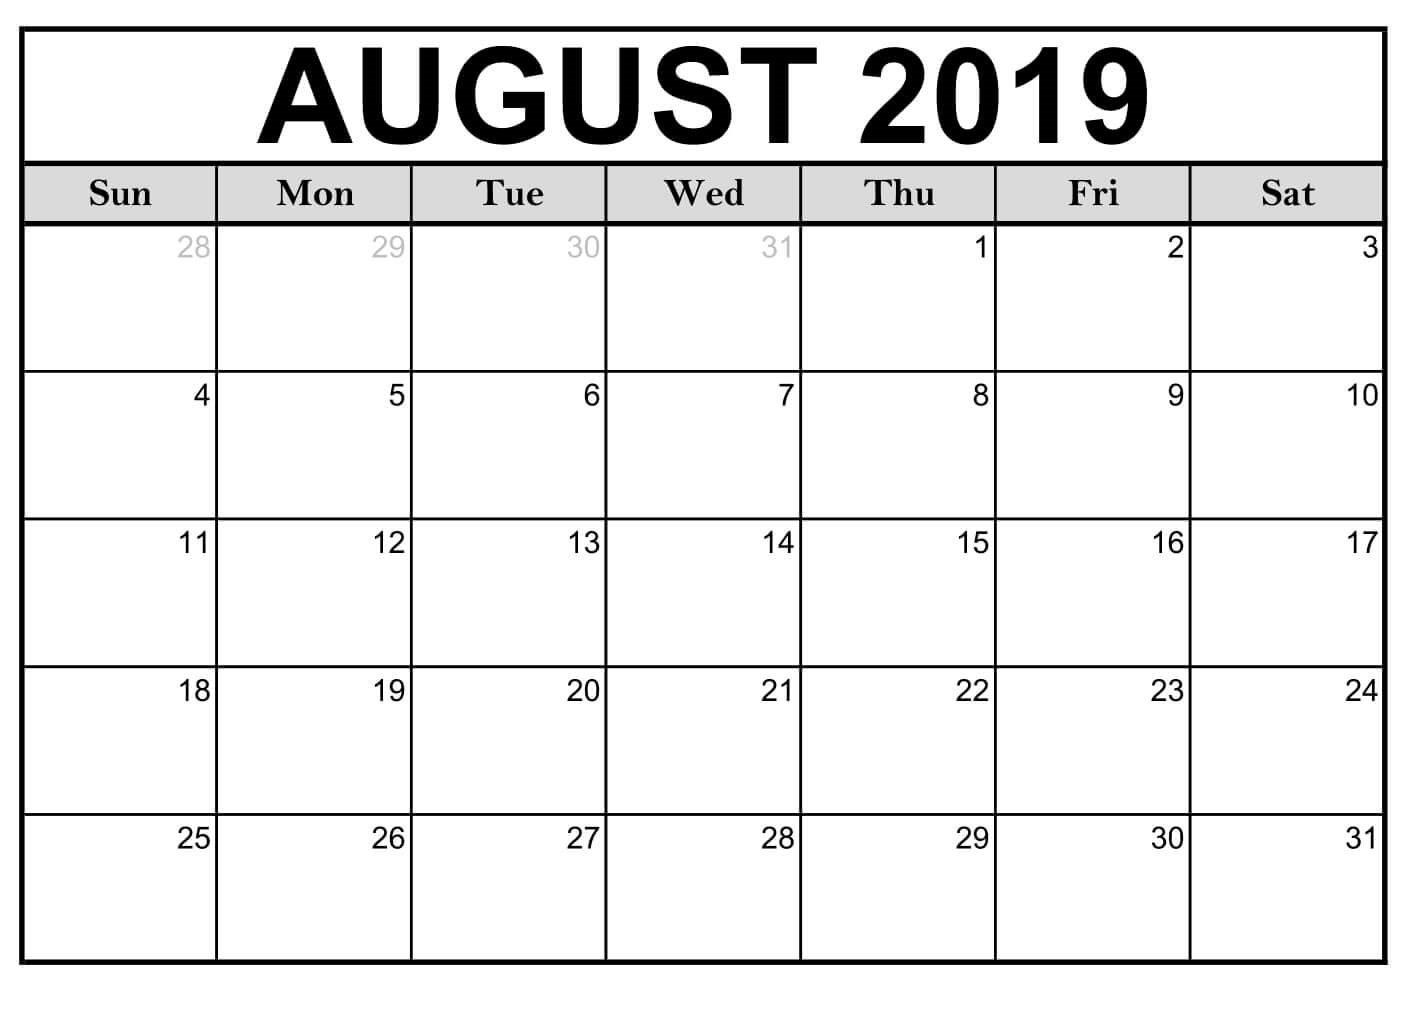 Blank August 2019 Calendar Page – Free Printable Calendar & Template August 1 2019 Calendar